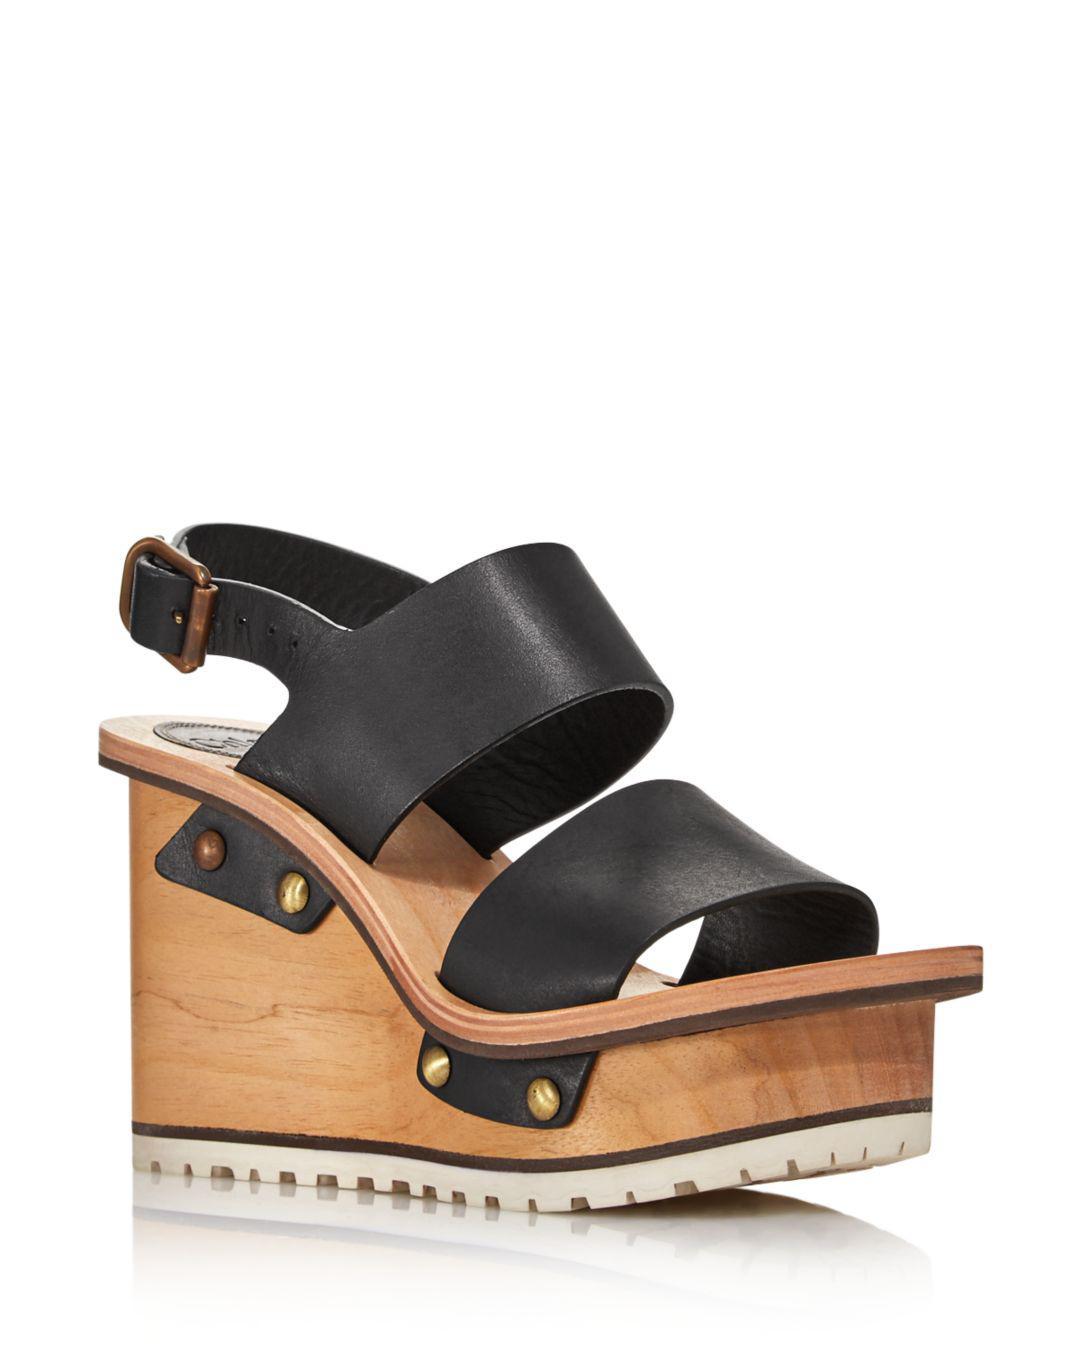 c1d87e5bf68 Lyst - Chloé Women s Valentine Platform Wedge Sandals in Black